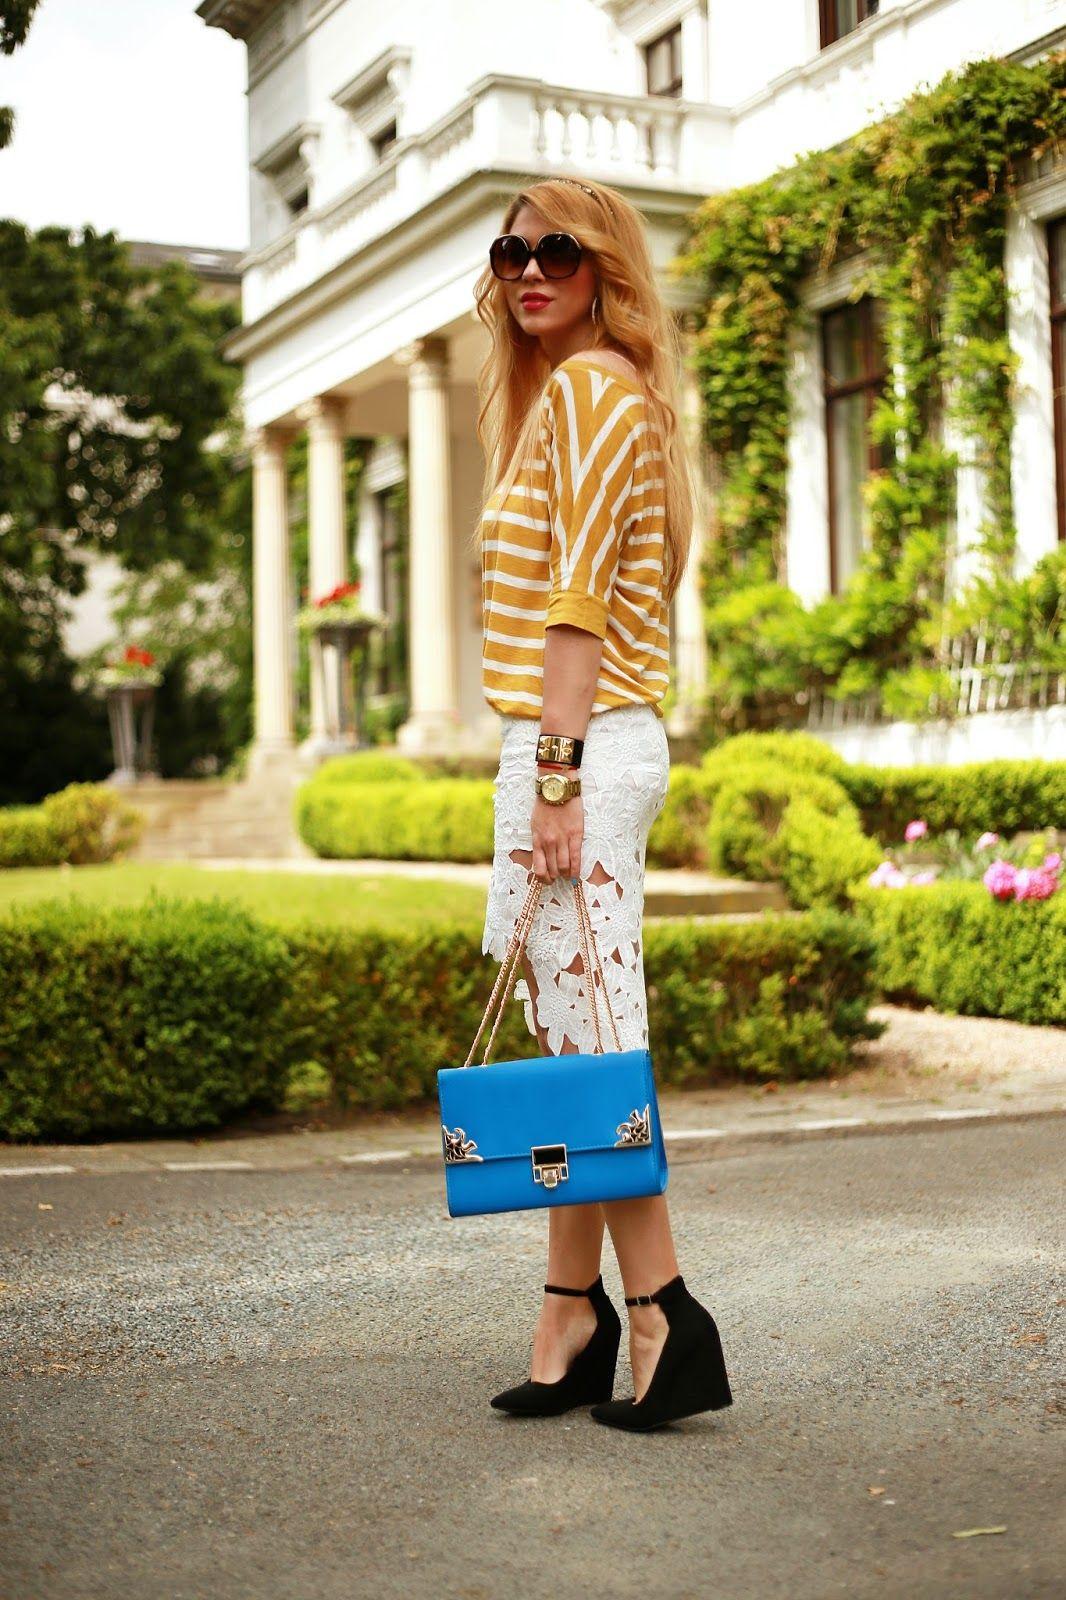 Fashion Painted Dreams: Sunny Stripes